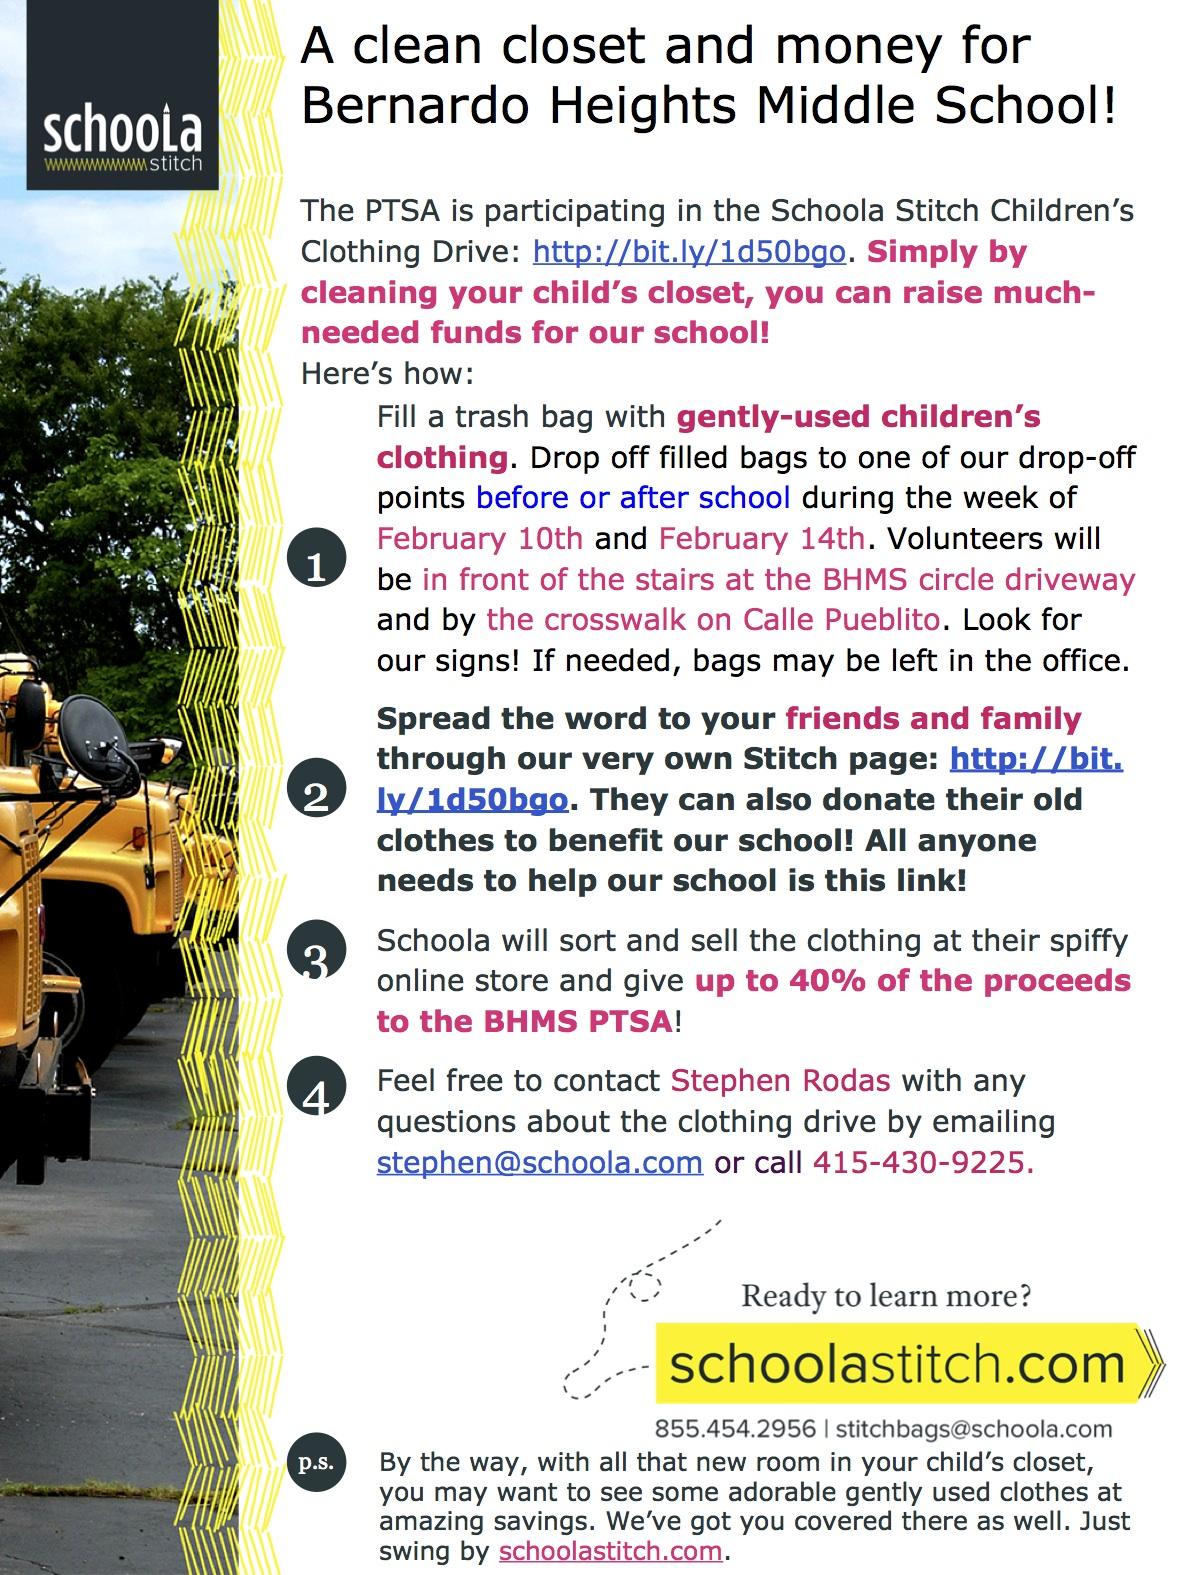 schoolastitch